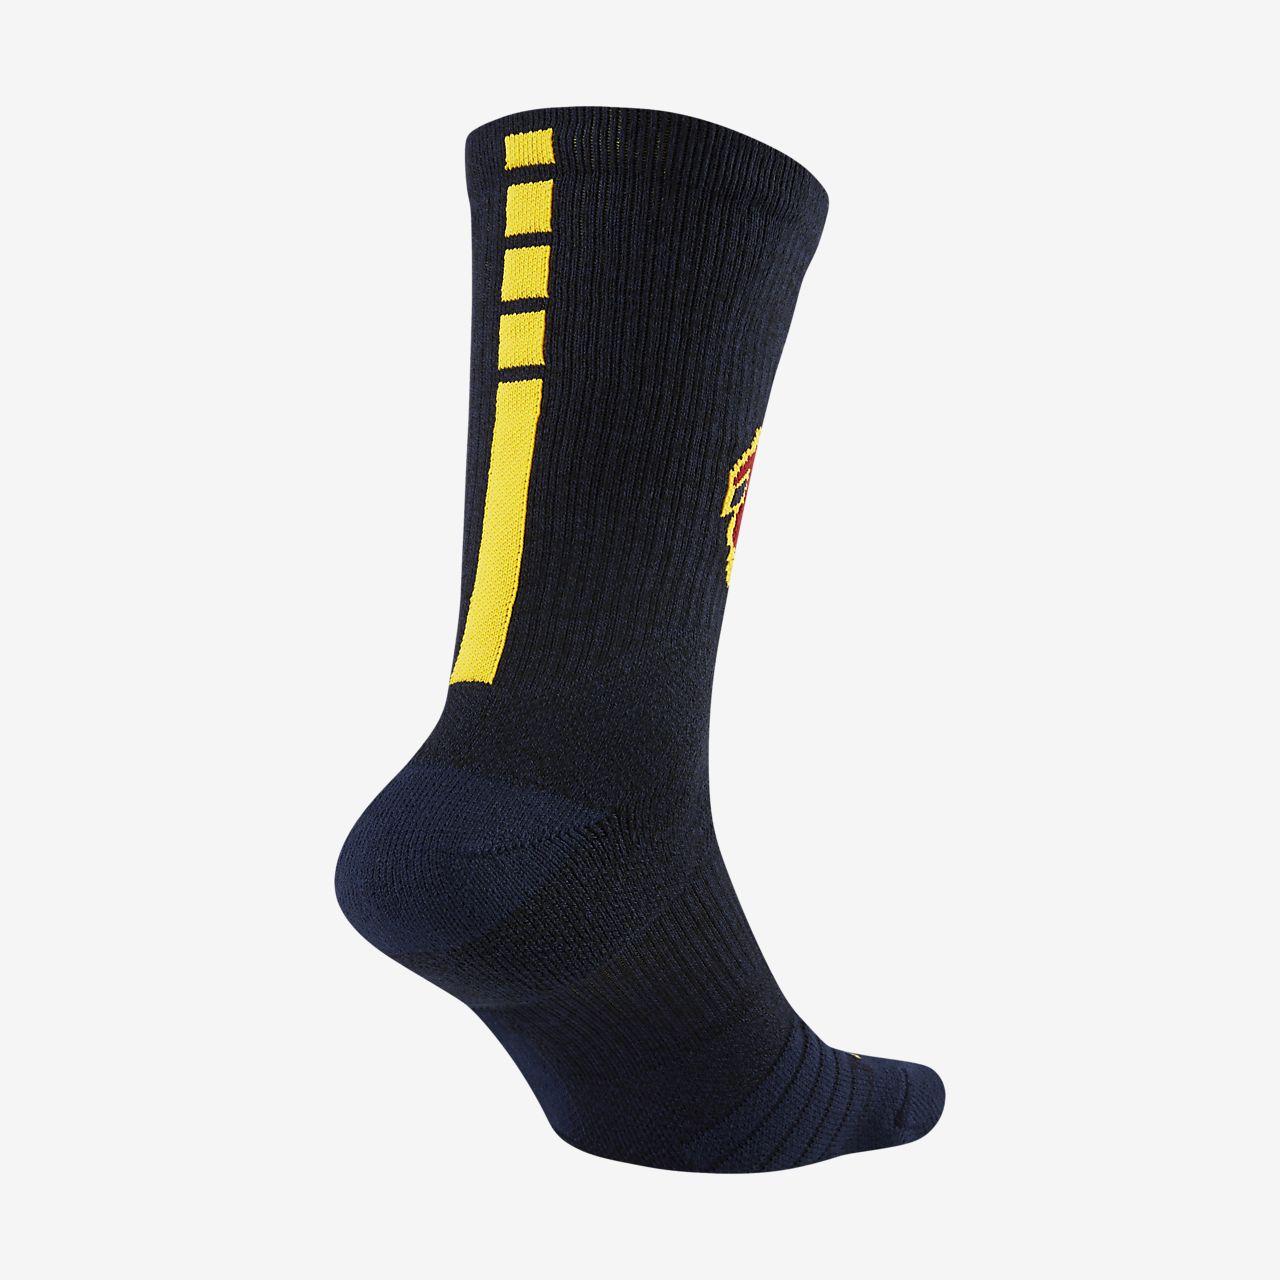 c9c82b5b706d Cleveland Cavaliers Nike Elite NBA Crew Socks. Nike.com RO